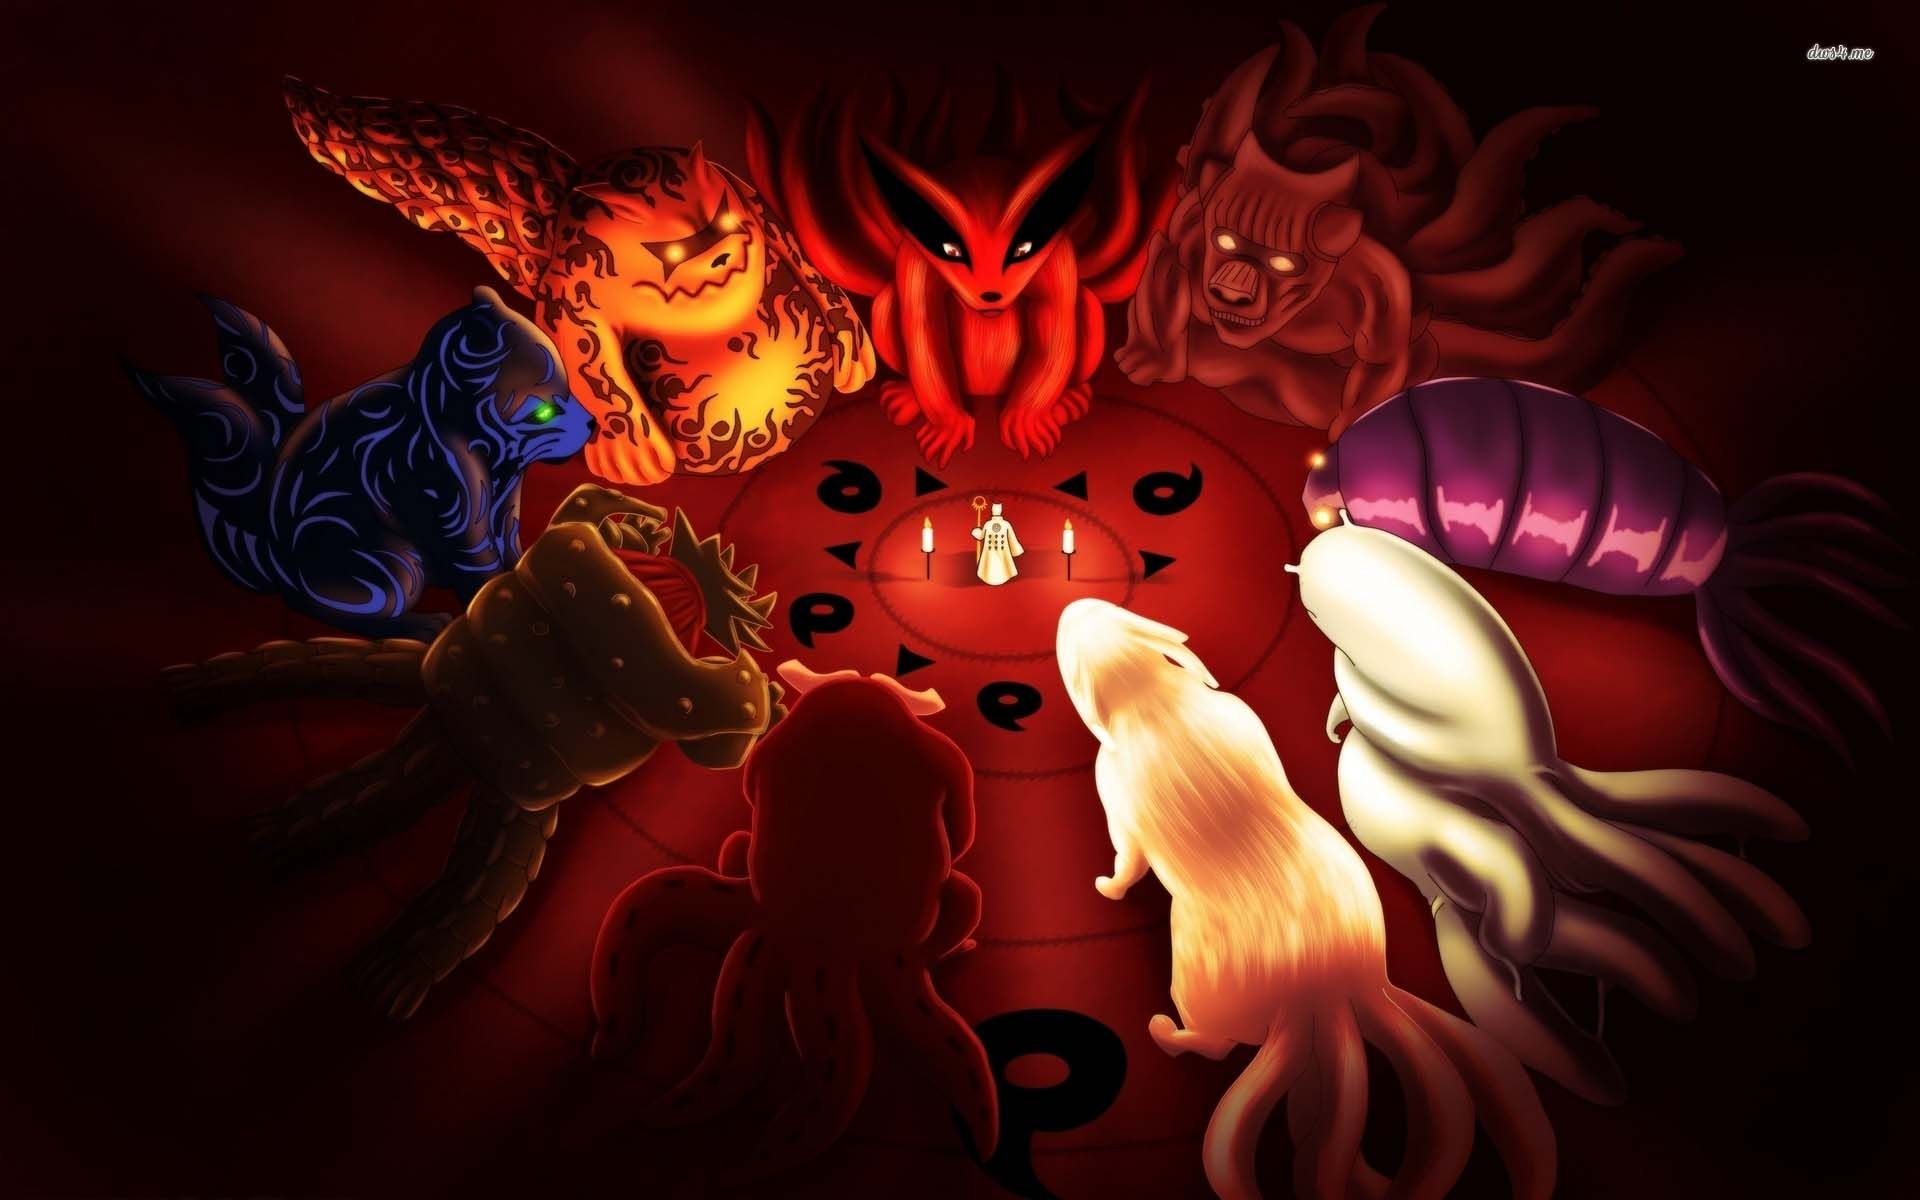 naruto wallpaper anime wallpaper Naruto wallpaper